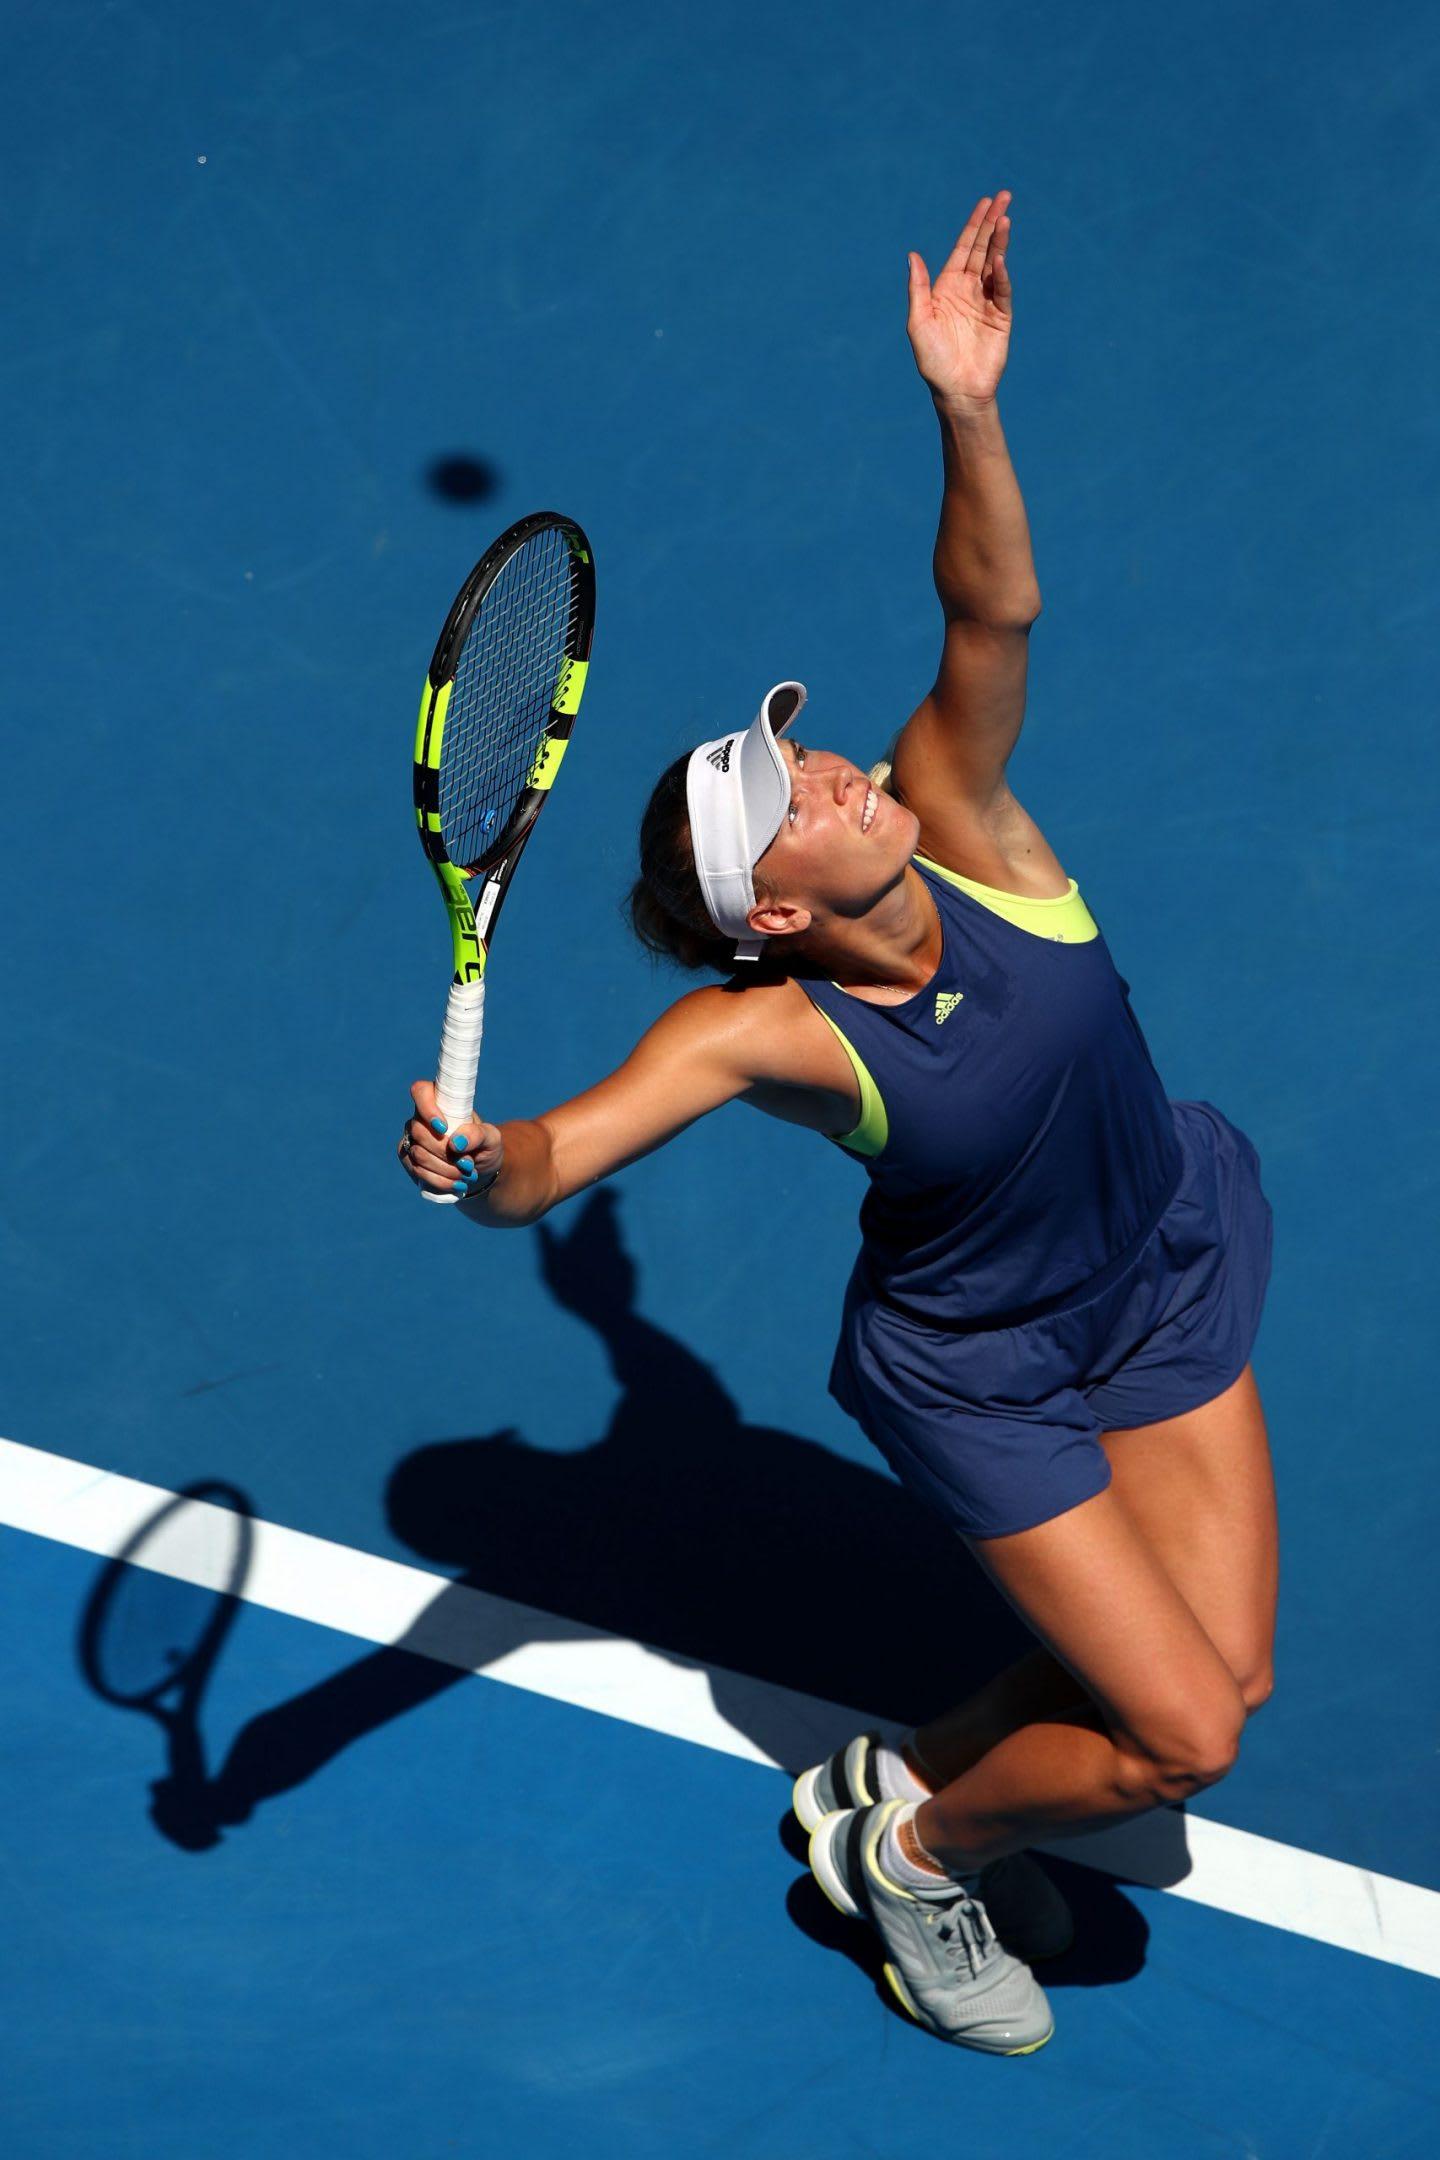 Woman in a navy tennis dress serving a ball on a blue tennis court, Caroline Wozniacki, tennis, player, Danish, athlete, sports, adidas, exercise